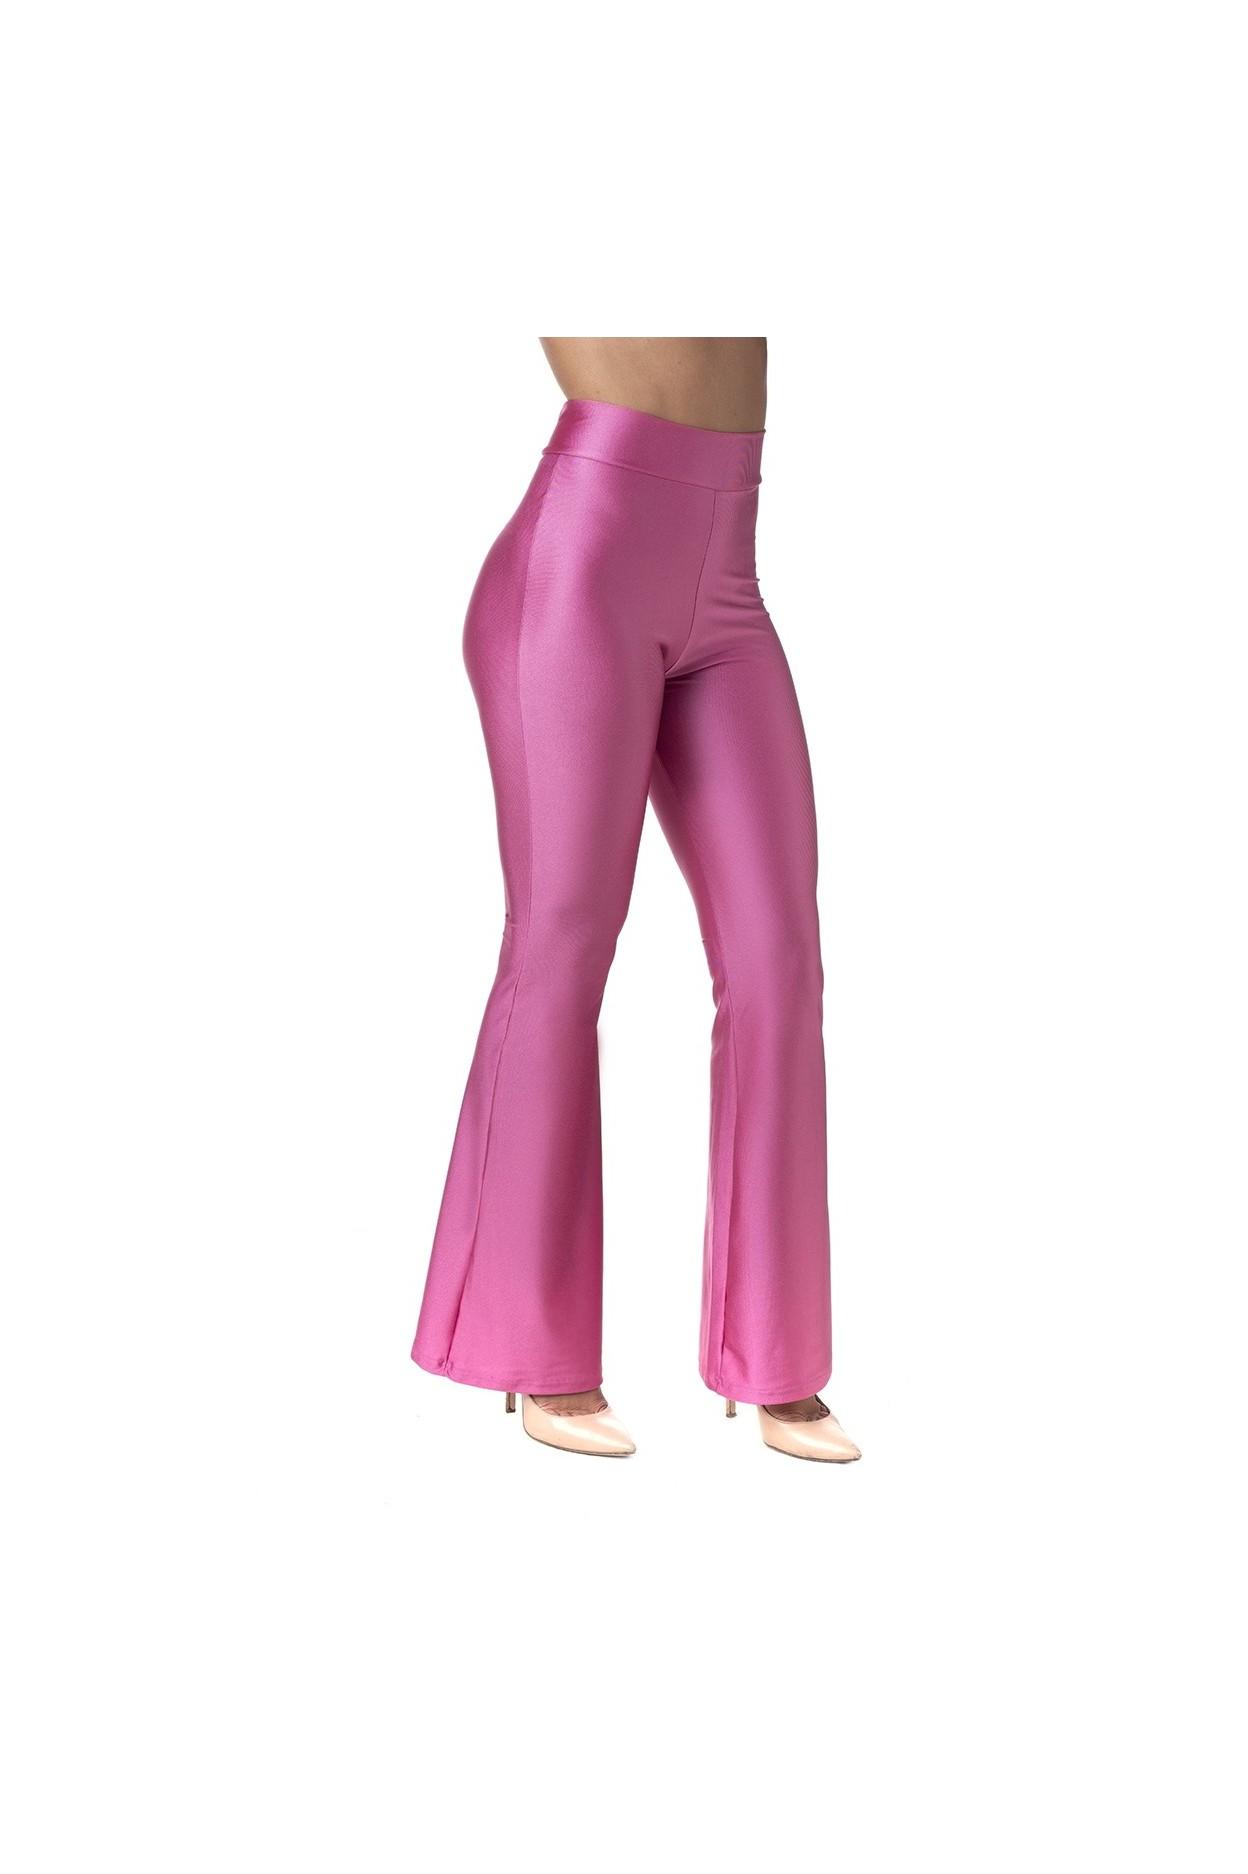 pantalone zampa donna lycra lucida fuxia